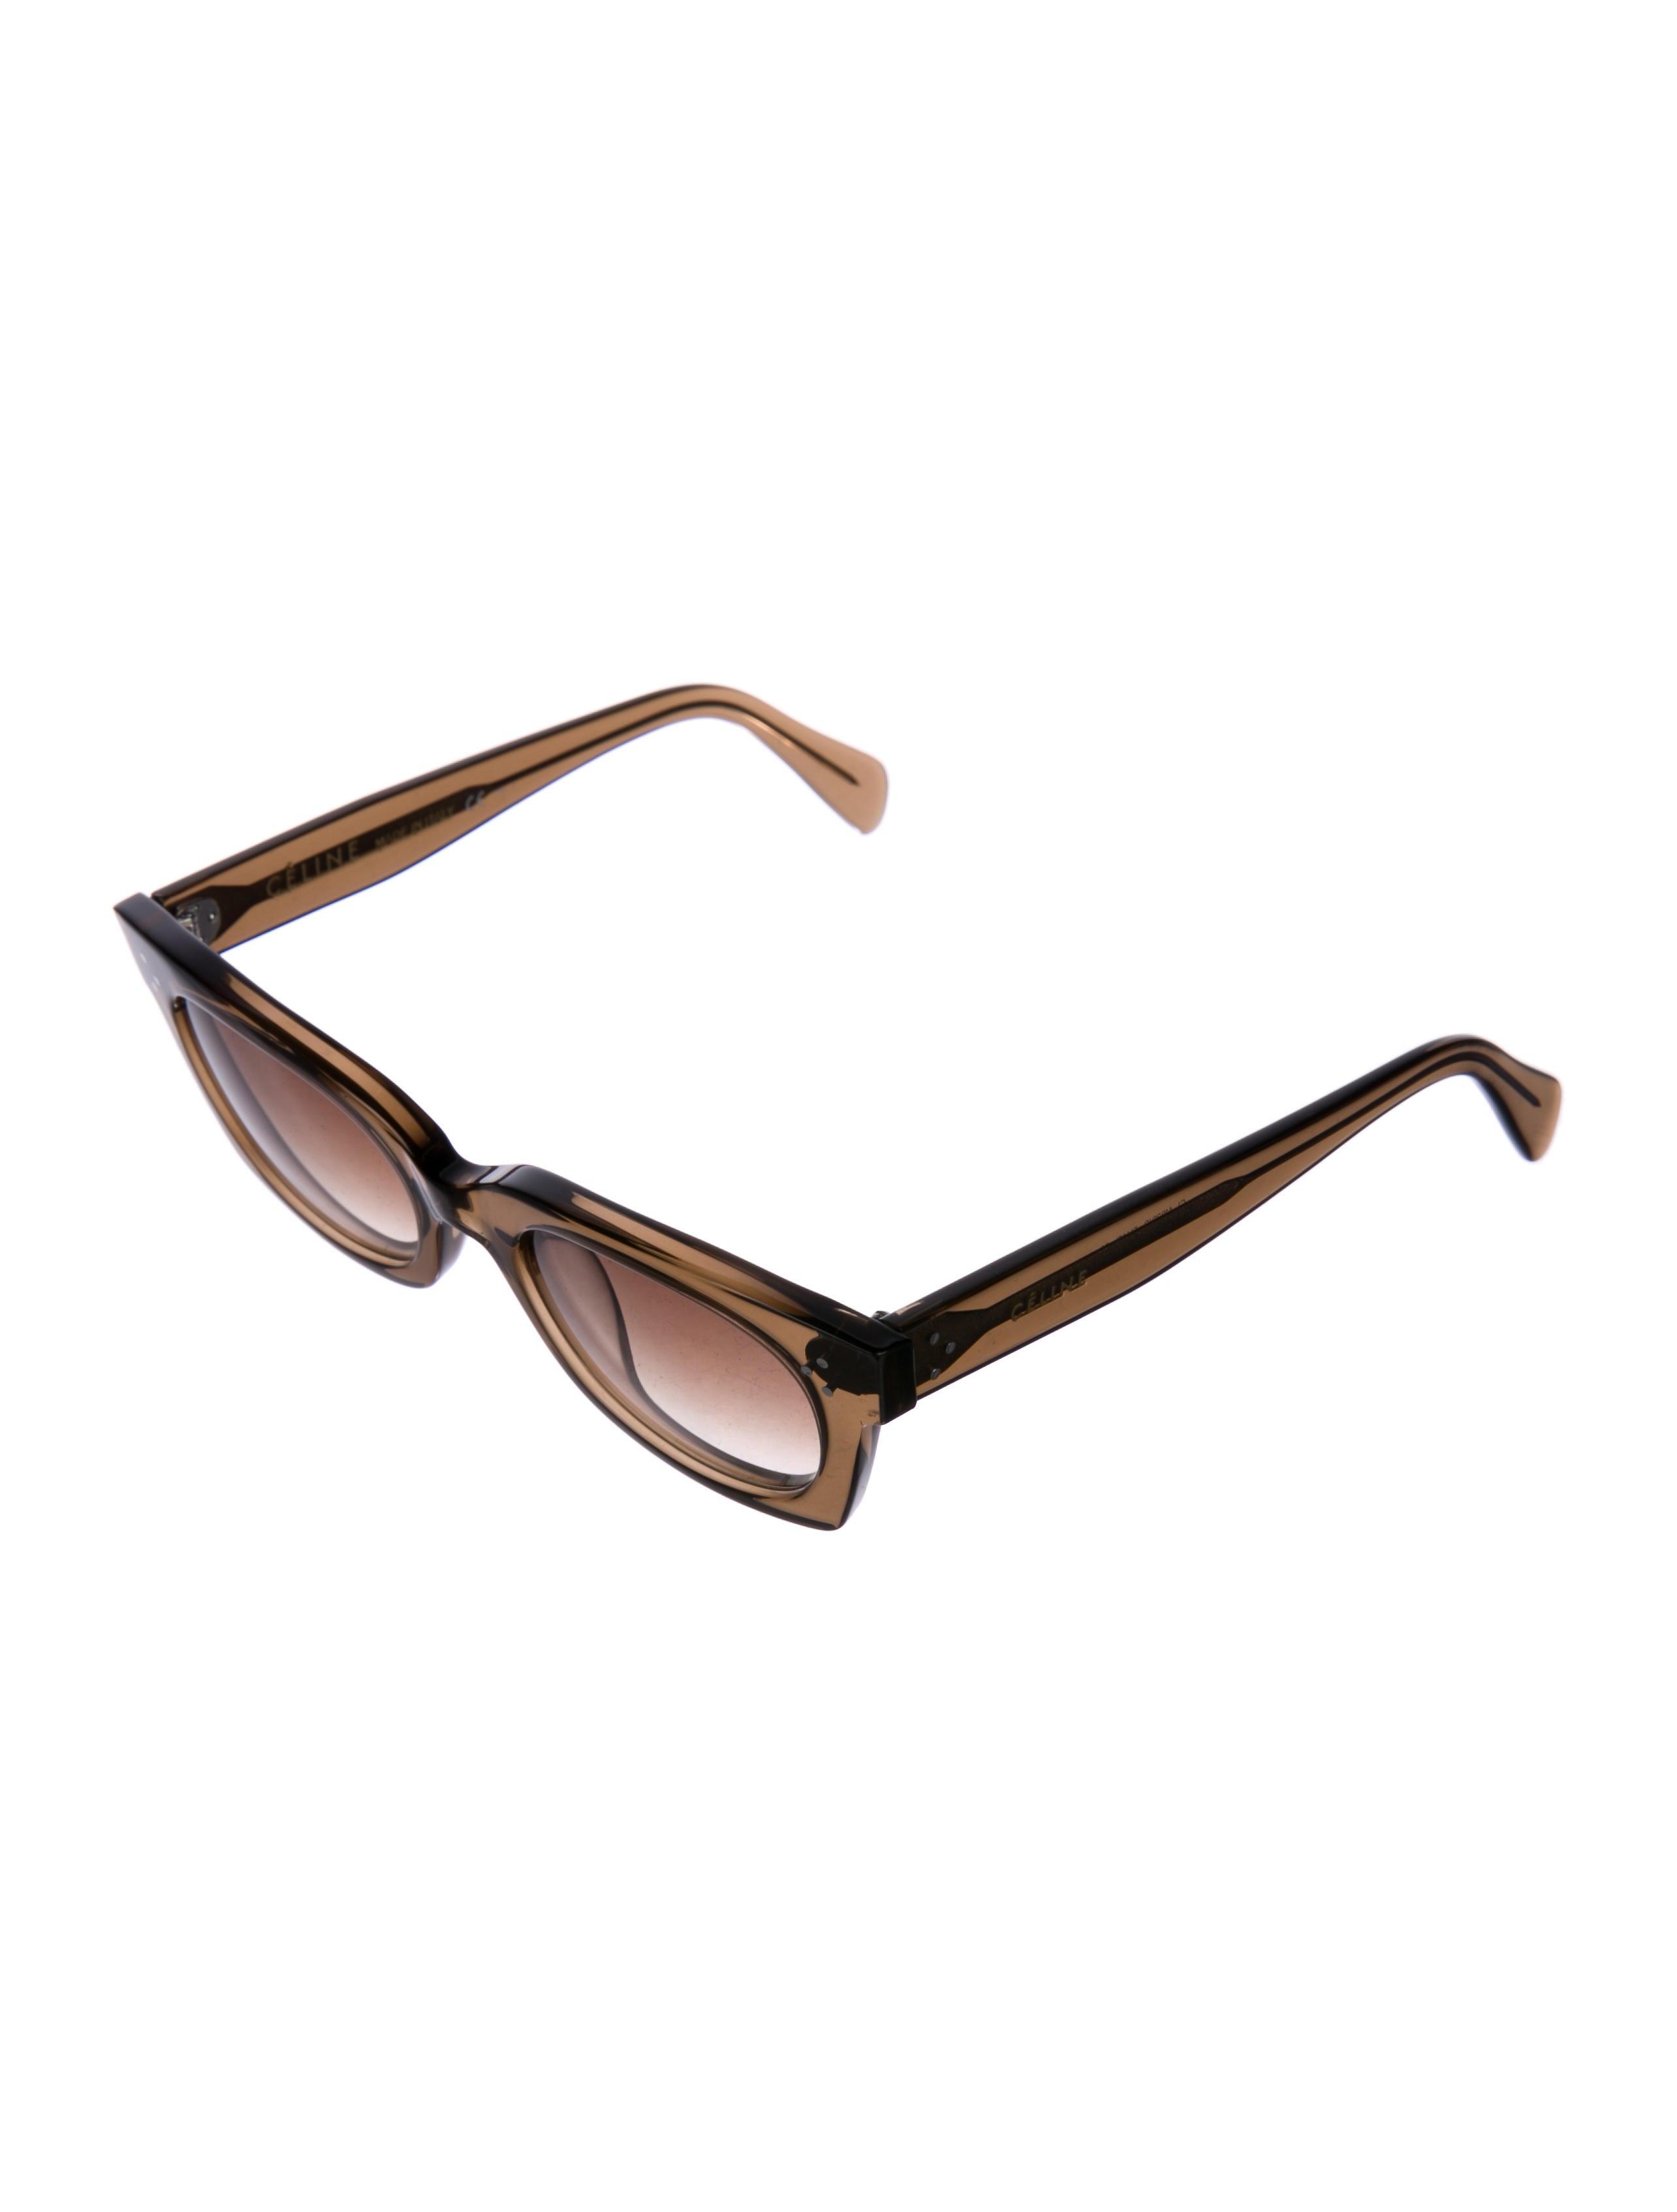 Gradient Cel67427 Celine Sofia Céline Accessories Sunglasses qUMzVjGLSp